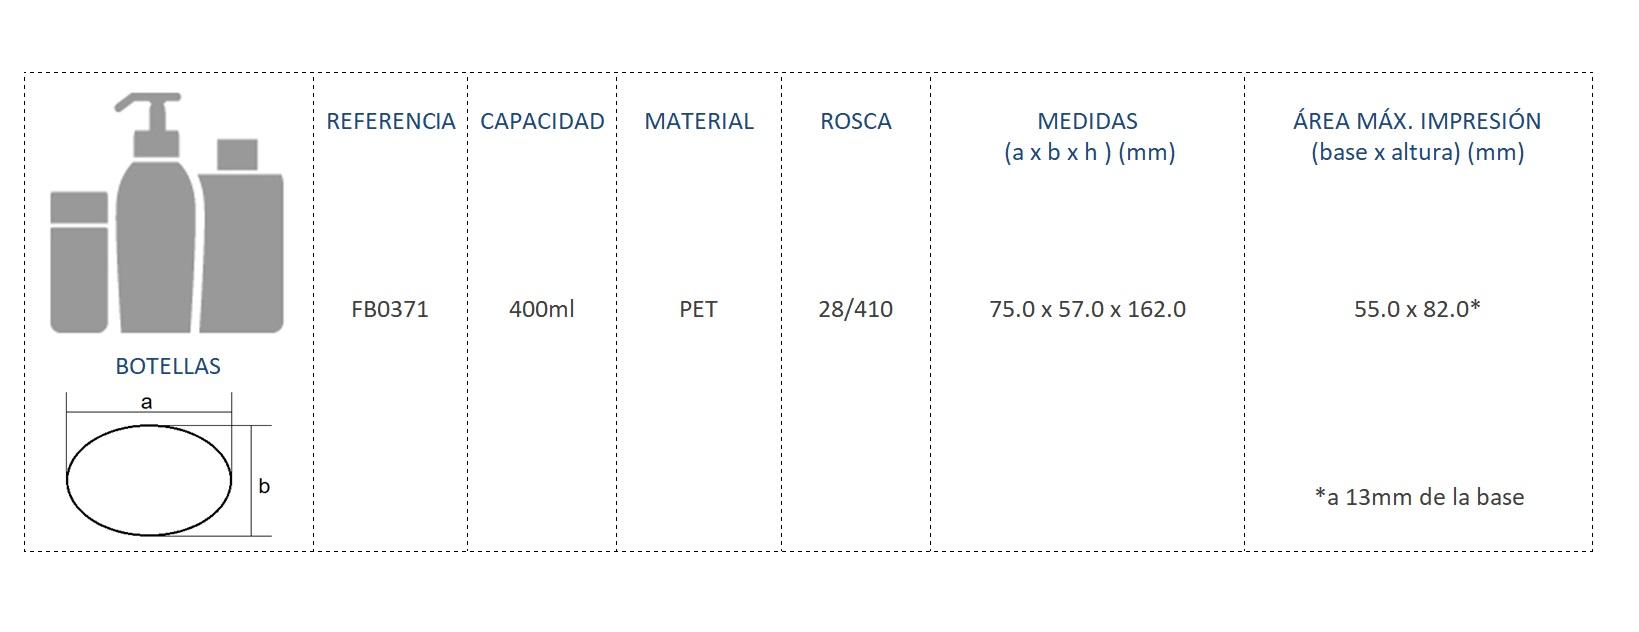 Cuadro de materiales botella FB0371